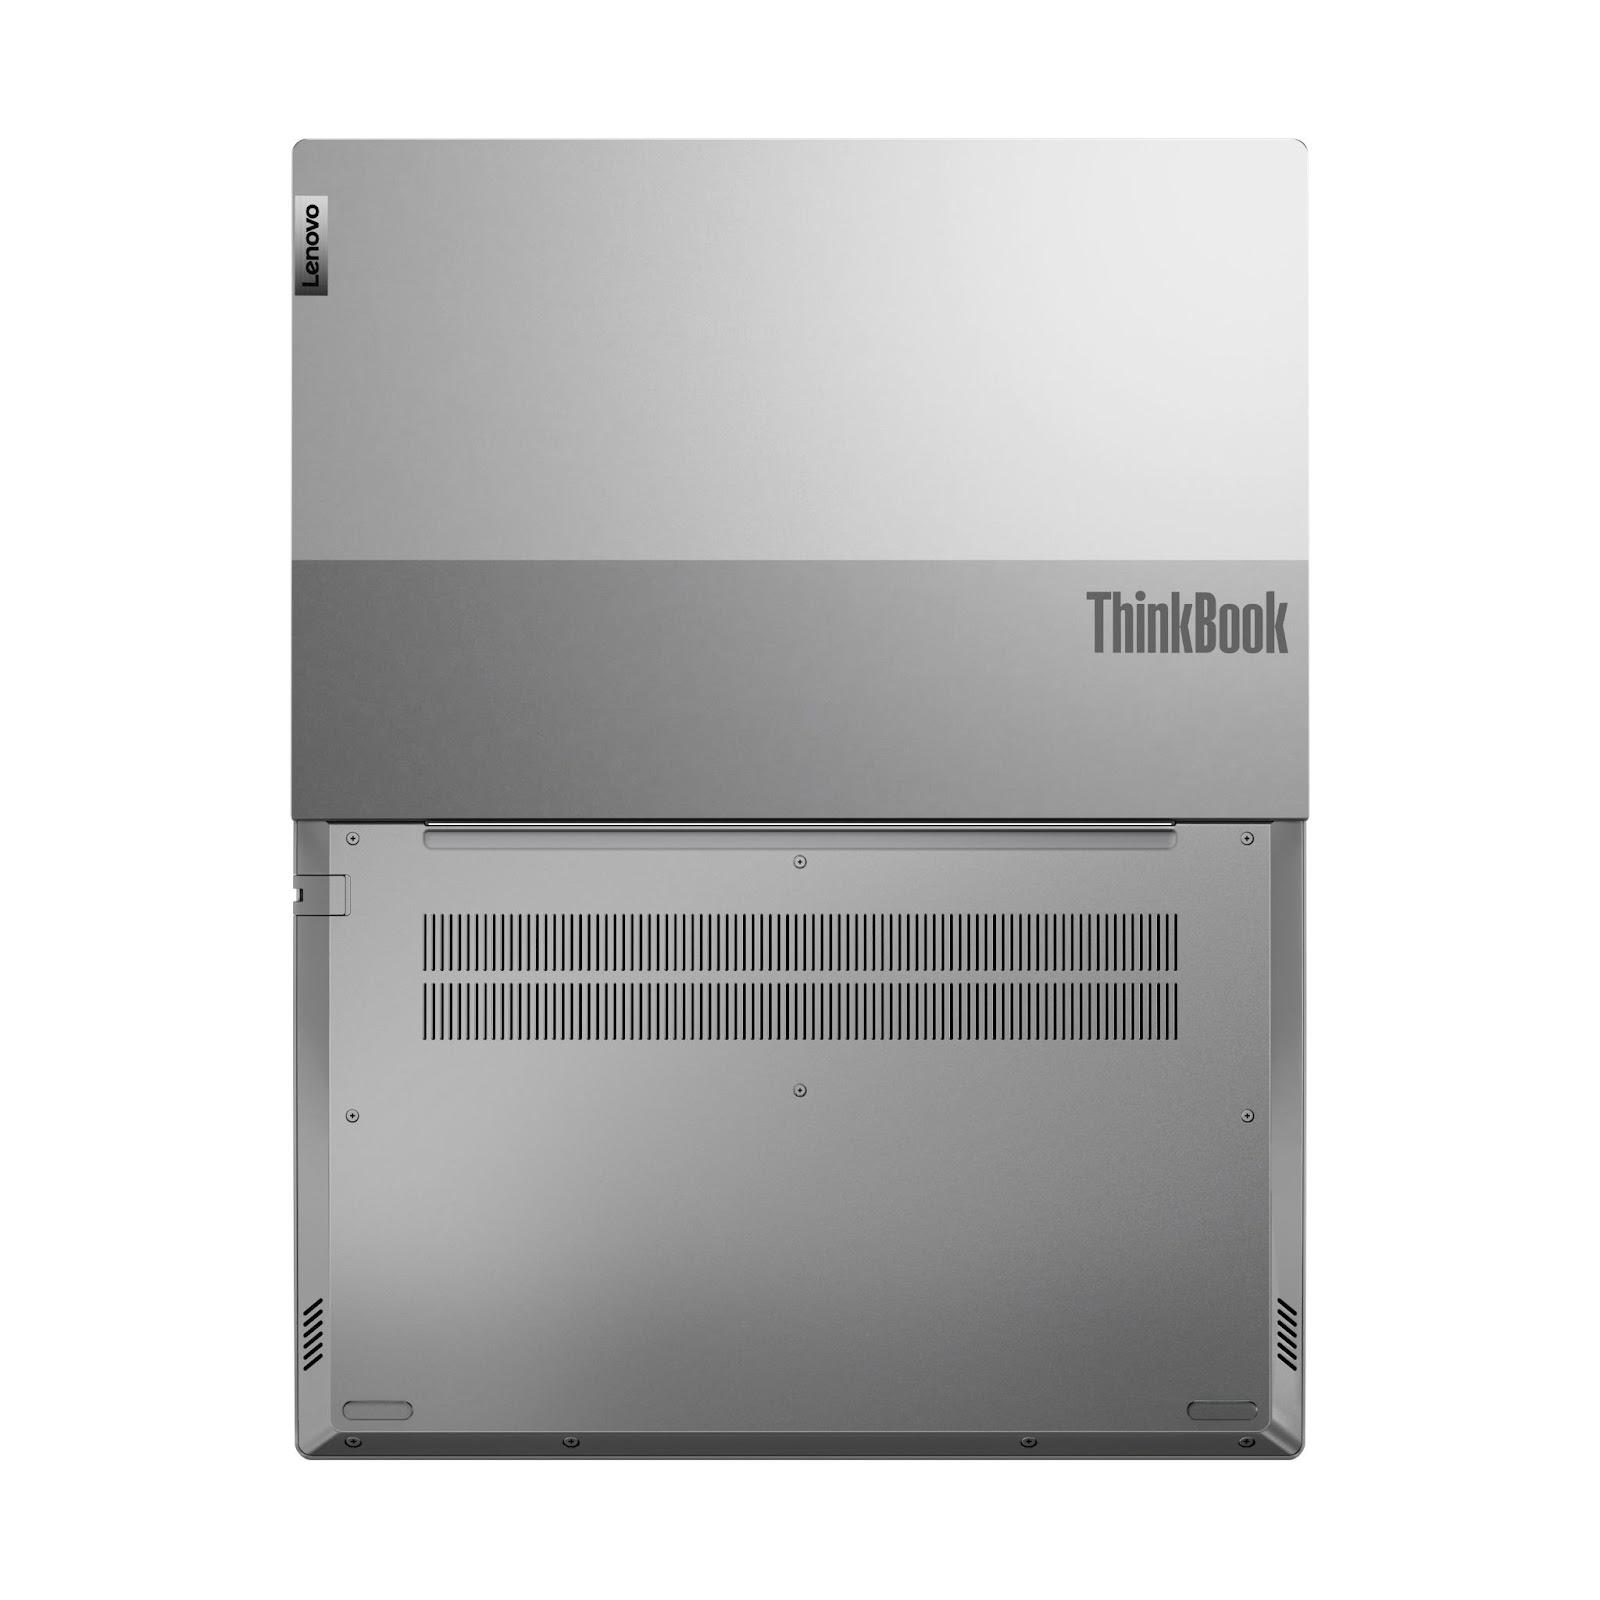 Фото 4. Ноутбук Lenovo ThinkBook 14 Gen 2 ITL Mineral Grey (20VD0044RU)